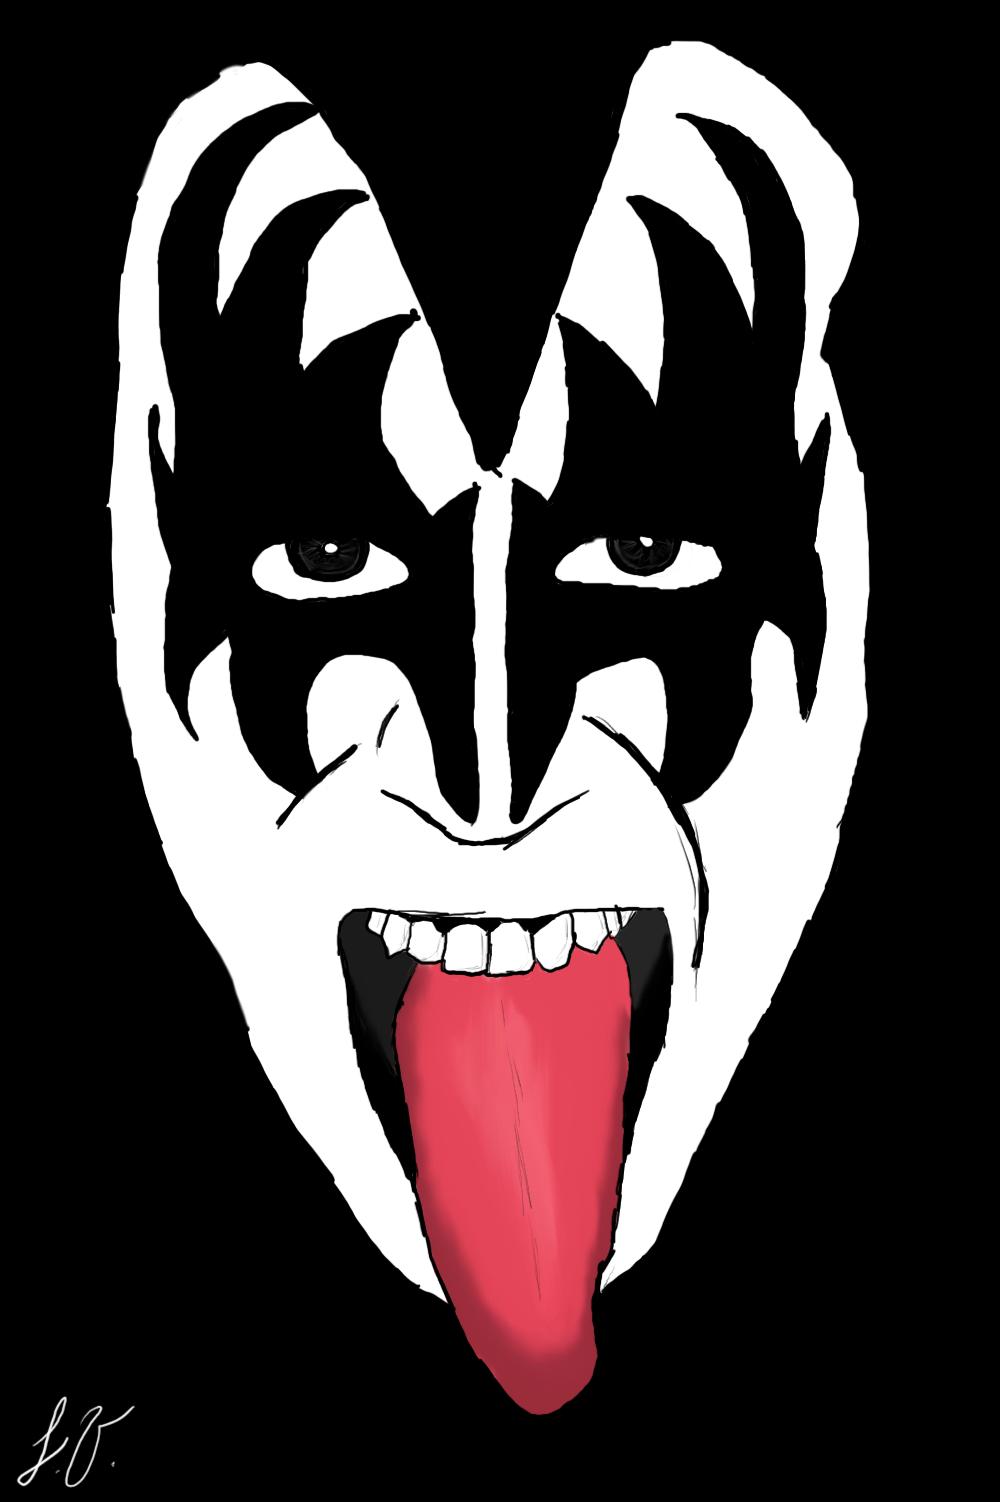 Gene Simmons By Johnnydavila On Deviantart